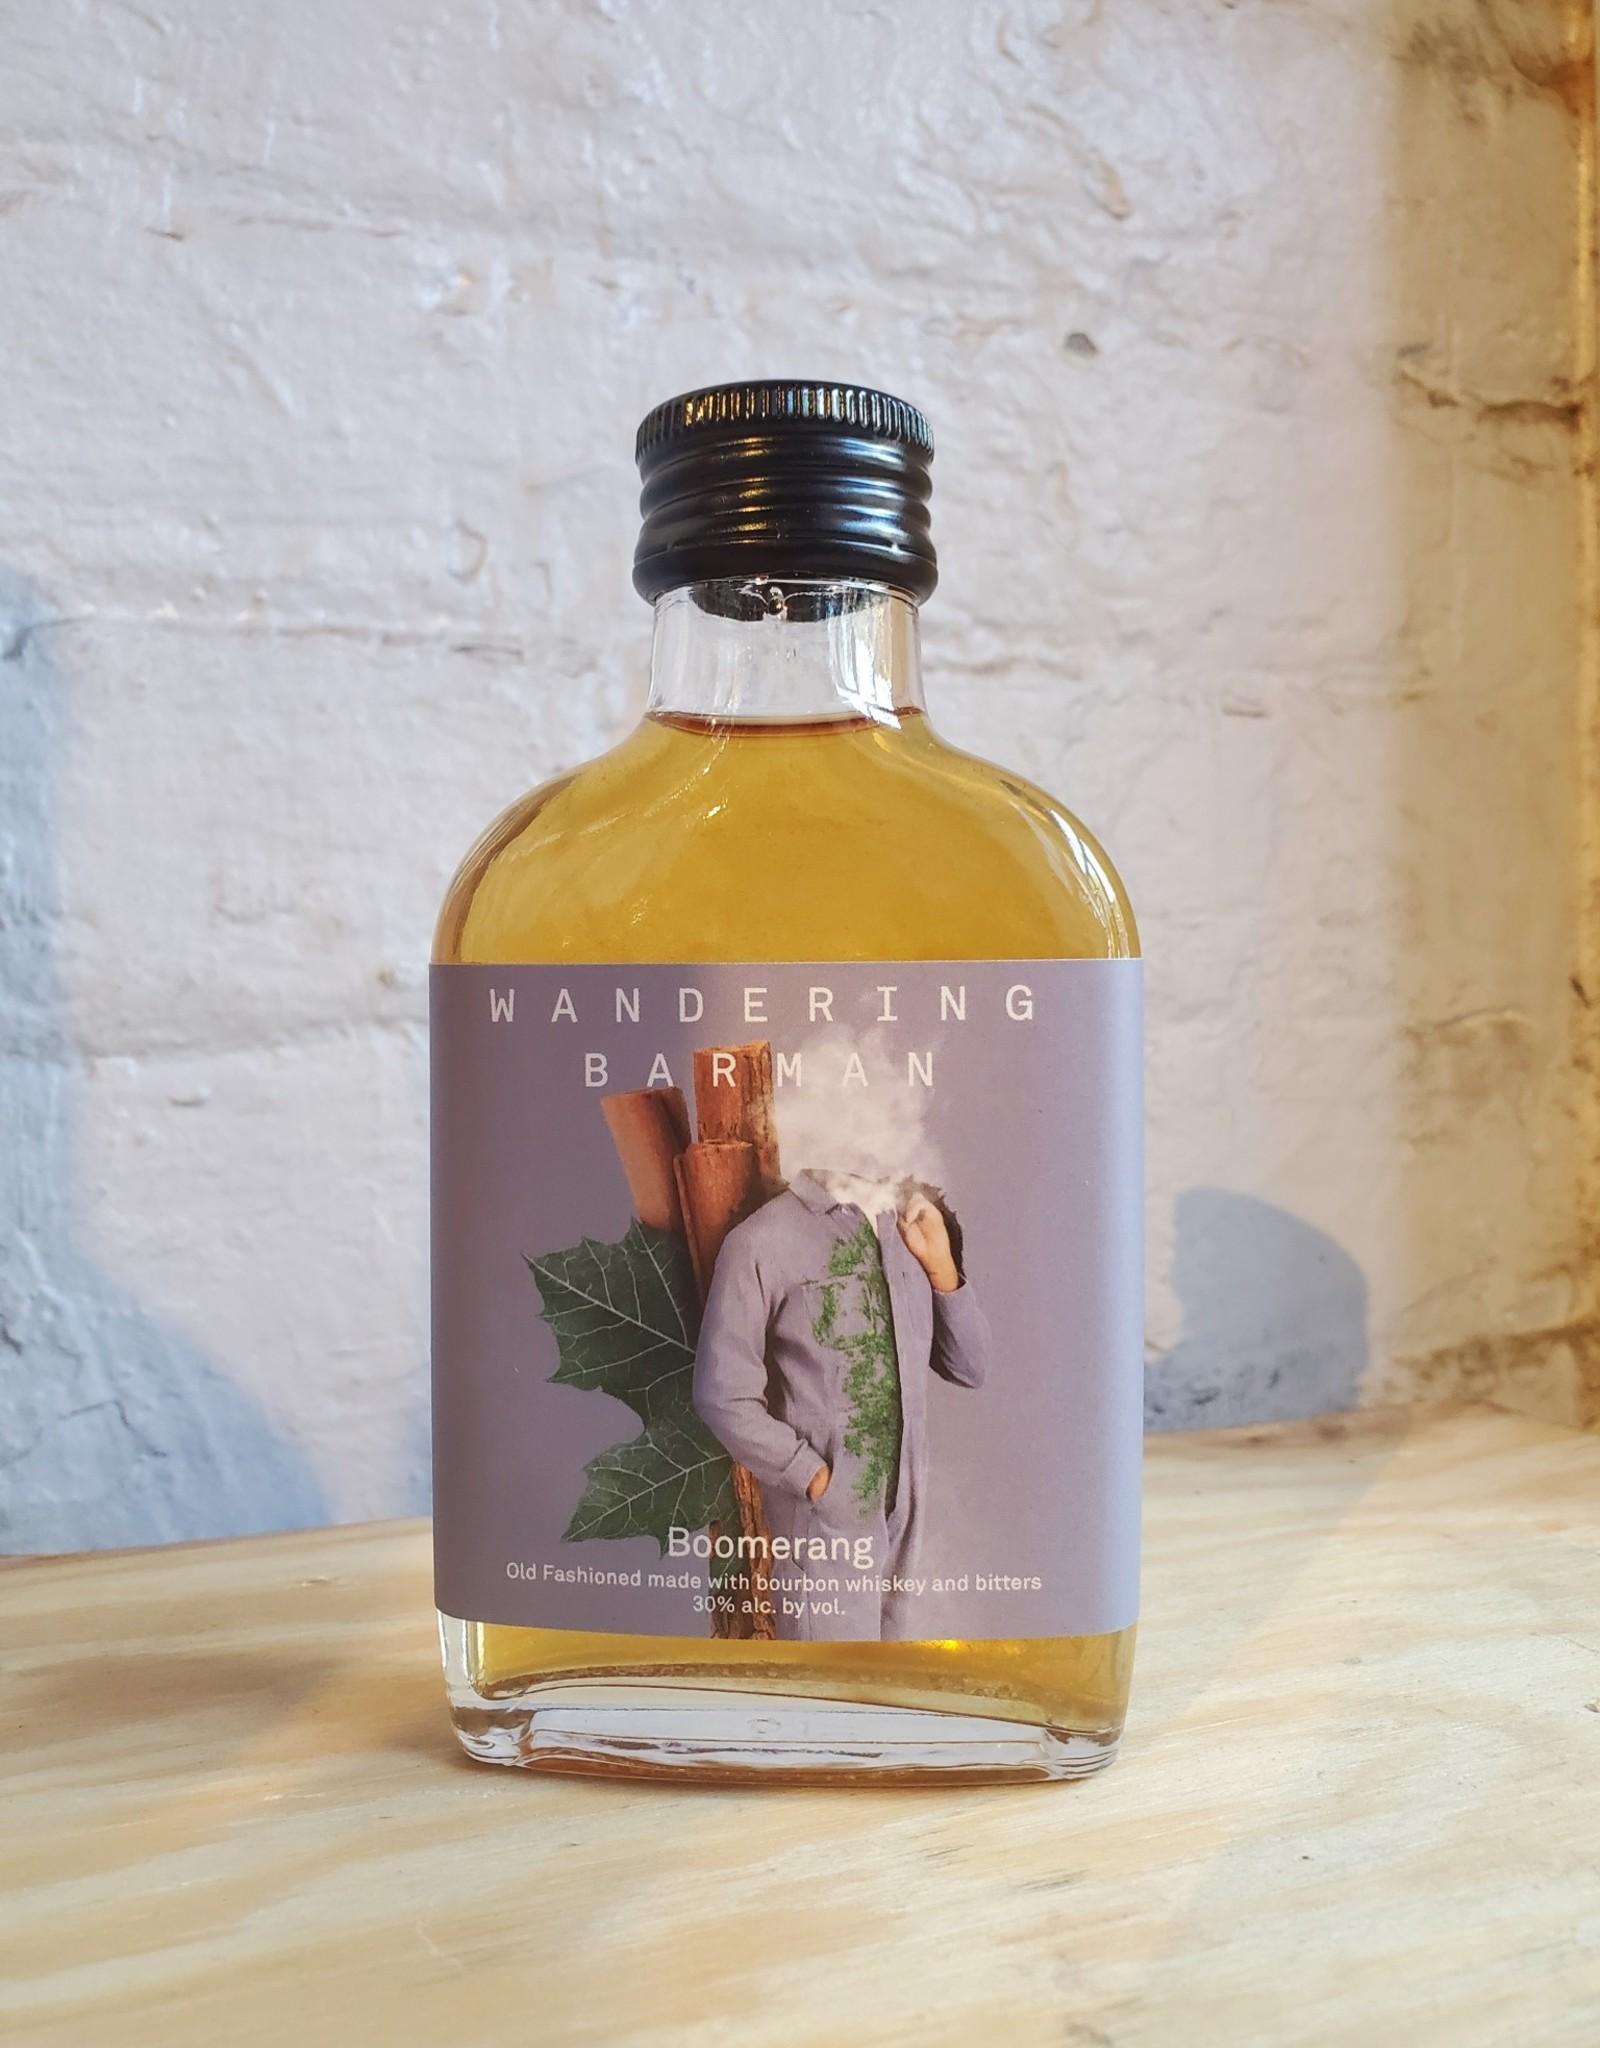 Wandering Barman Boomerang Burnt Maple Old Fashioned - Brooklyn, NY (100ml)